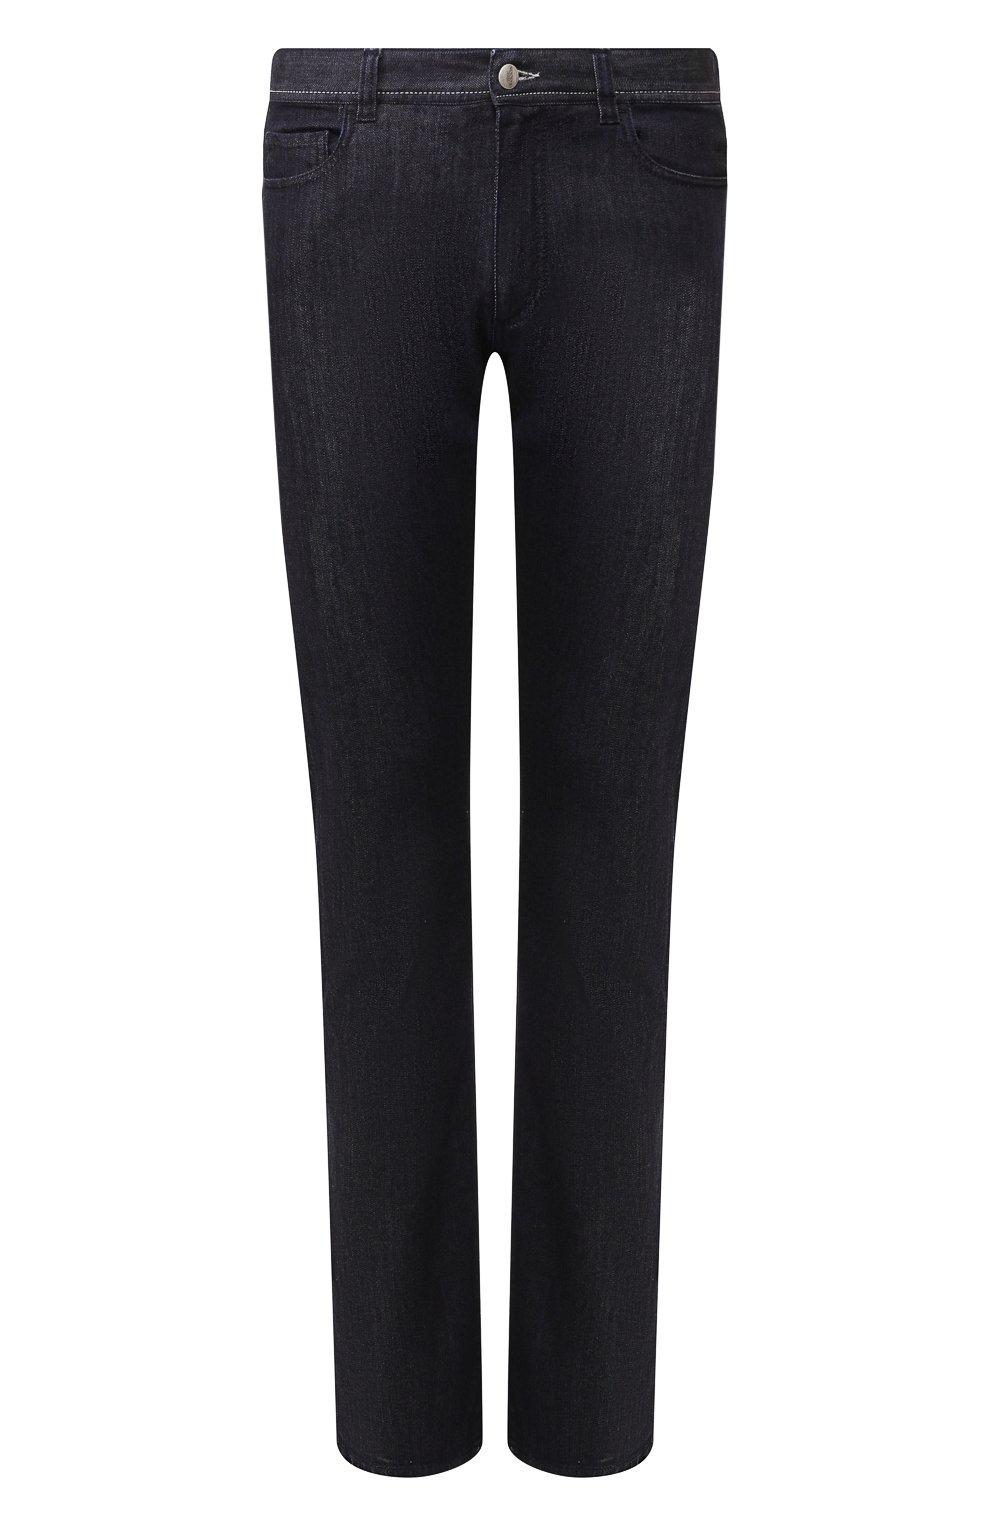 Мужские джинсы CANALI черного цвета, арт. 91770/PD00018 | Фото 1